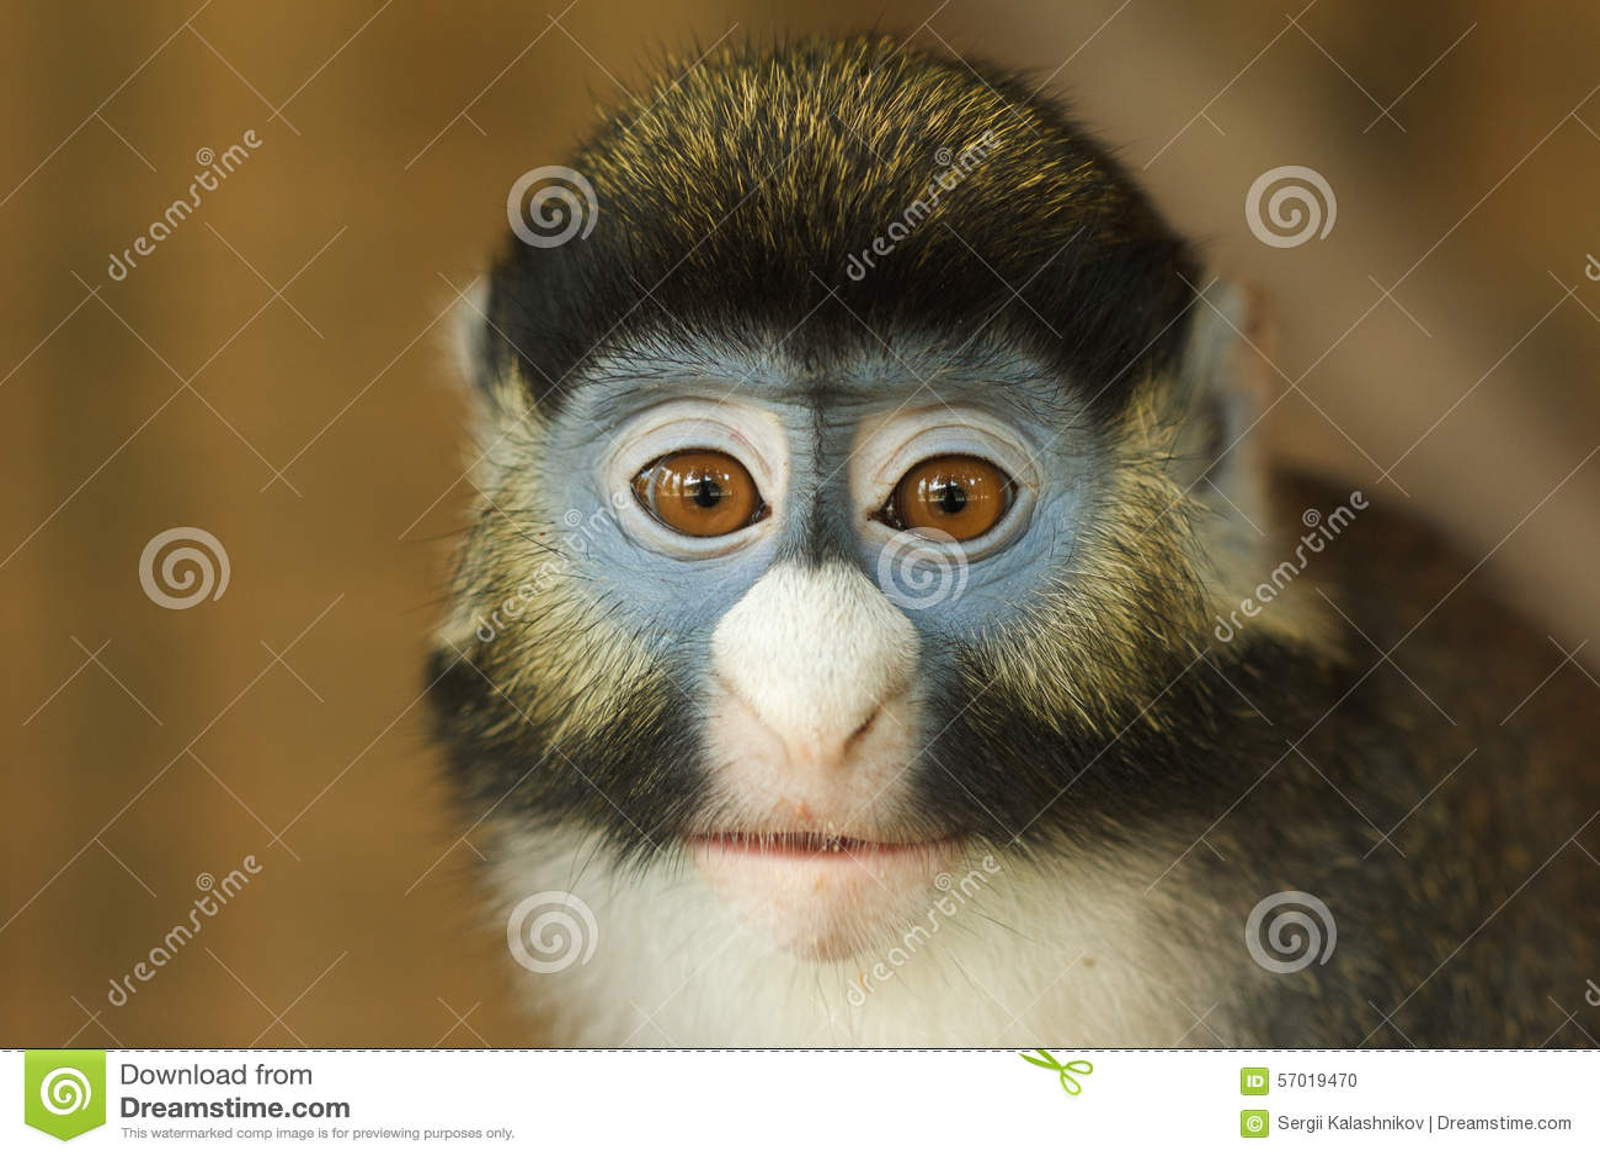 Frontal Portrait of Lesser Spot-Nosed Monkey